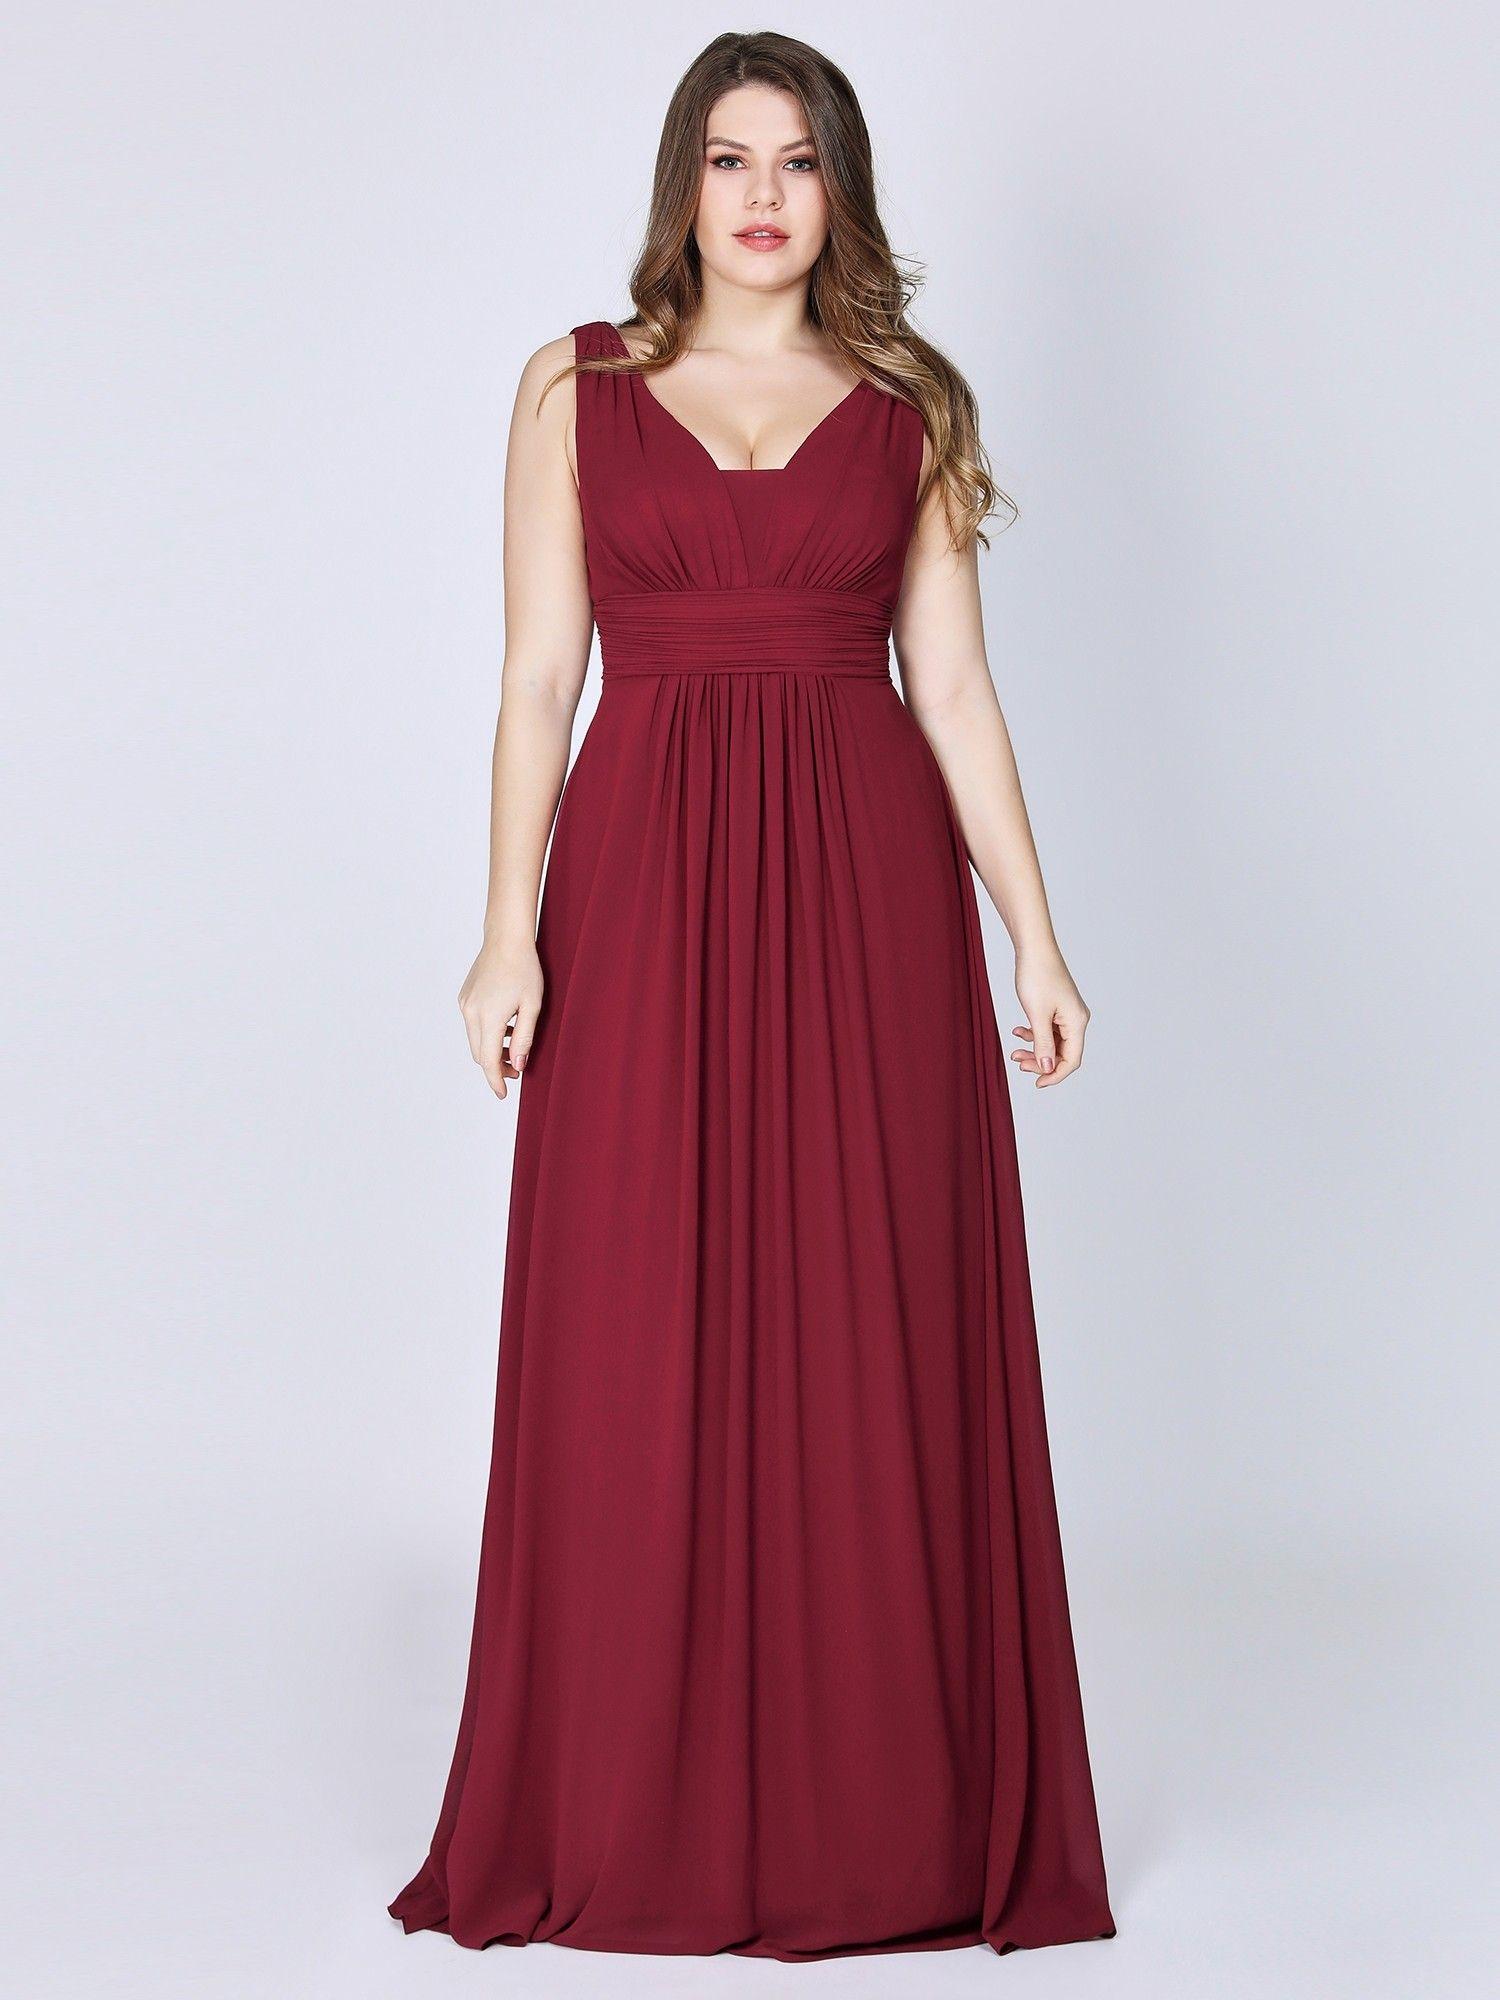 Sleeveless V Neck Plus Size Semi Formal Maxi Dresses For Weddings Maxi Dress Wedding Maxi Dress Evening Maid Of Honour Dresses,Wedding Dresses In Texas